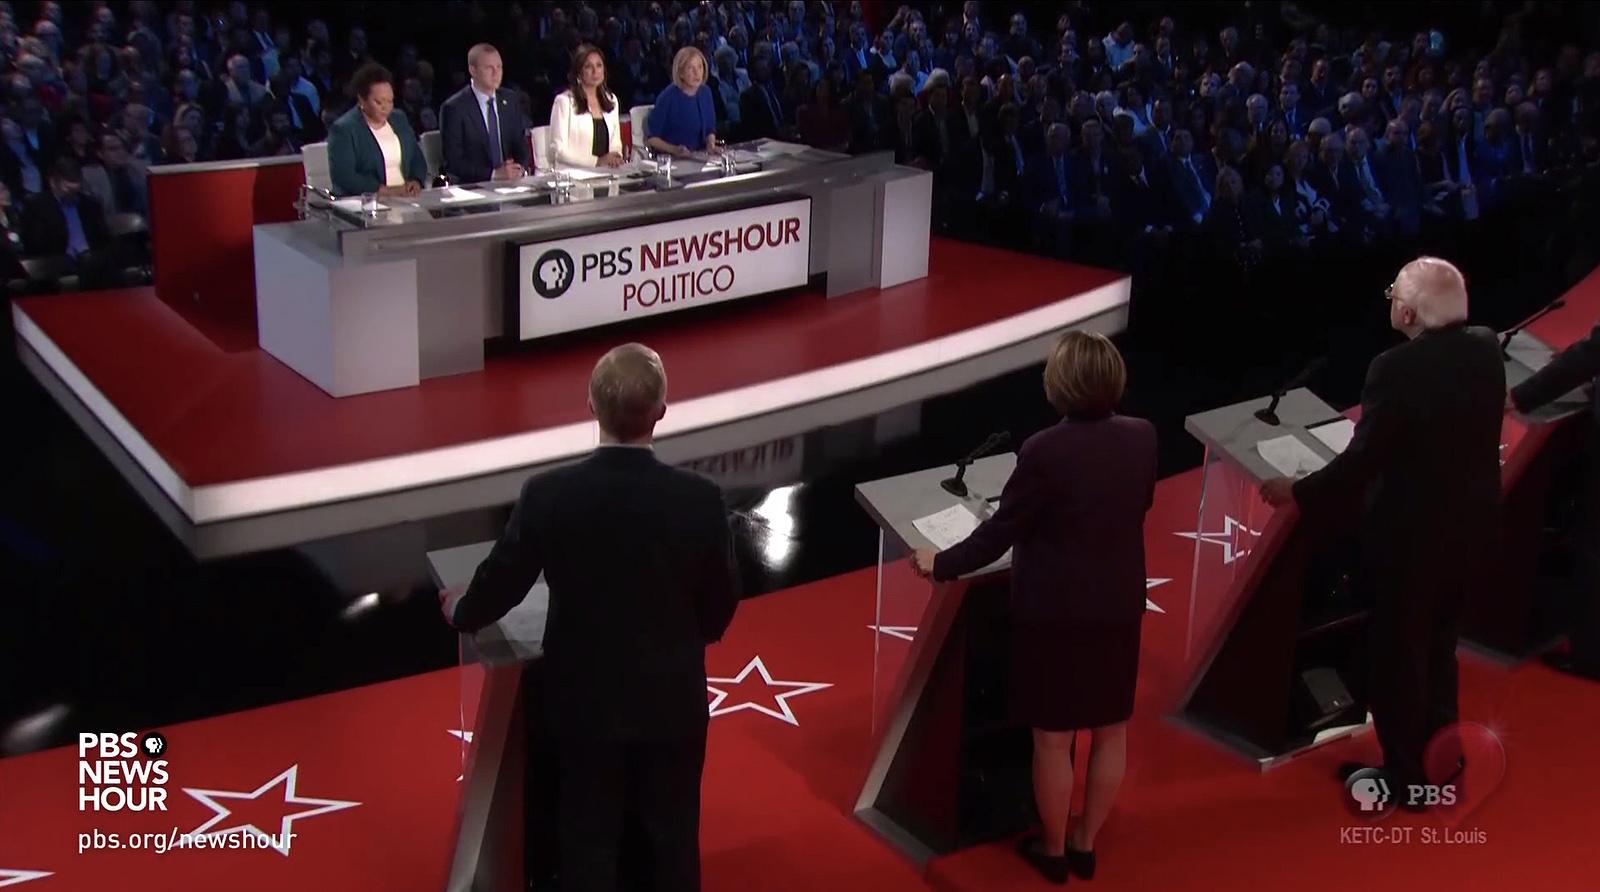 NCS_PBS-NewsHour_Politico_Democratic-Debate_012